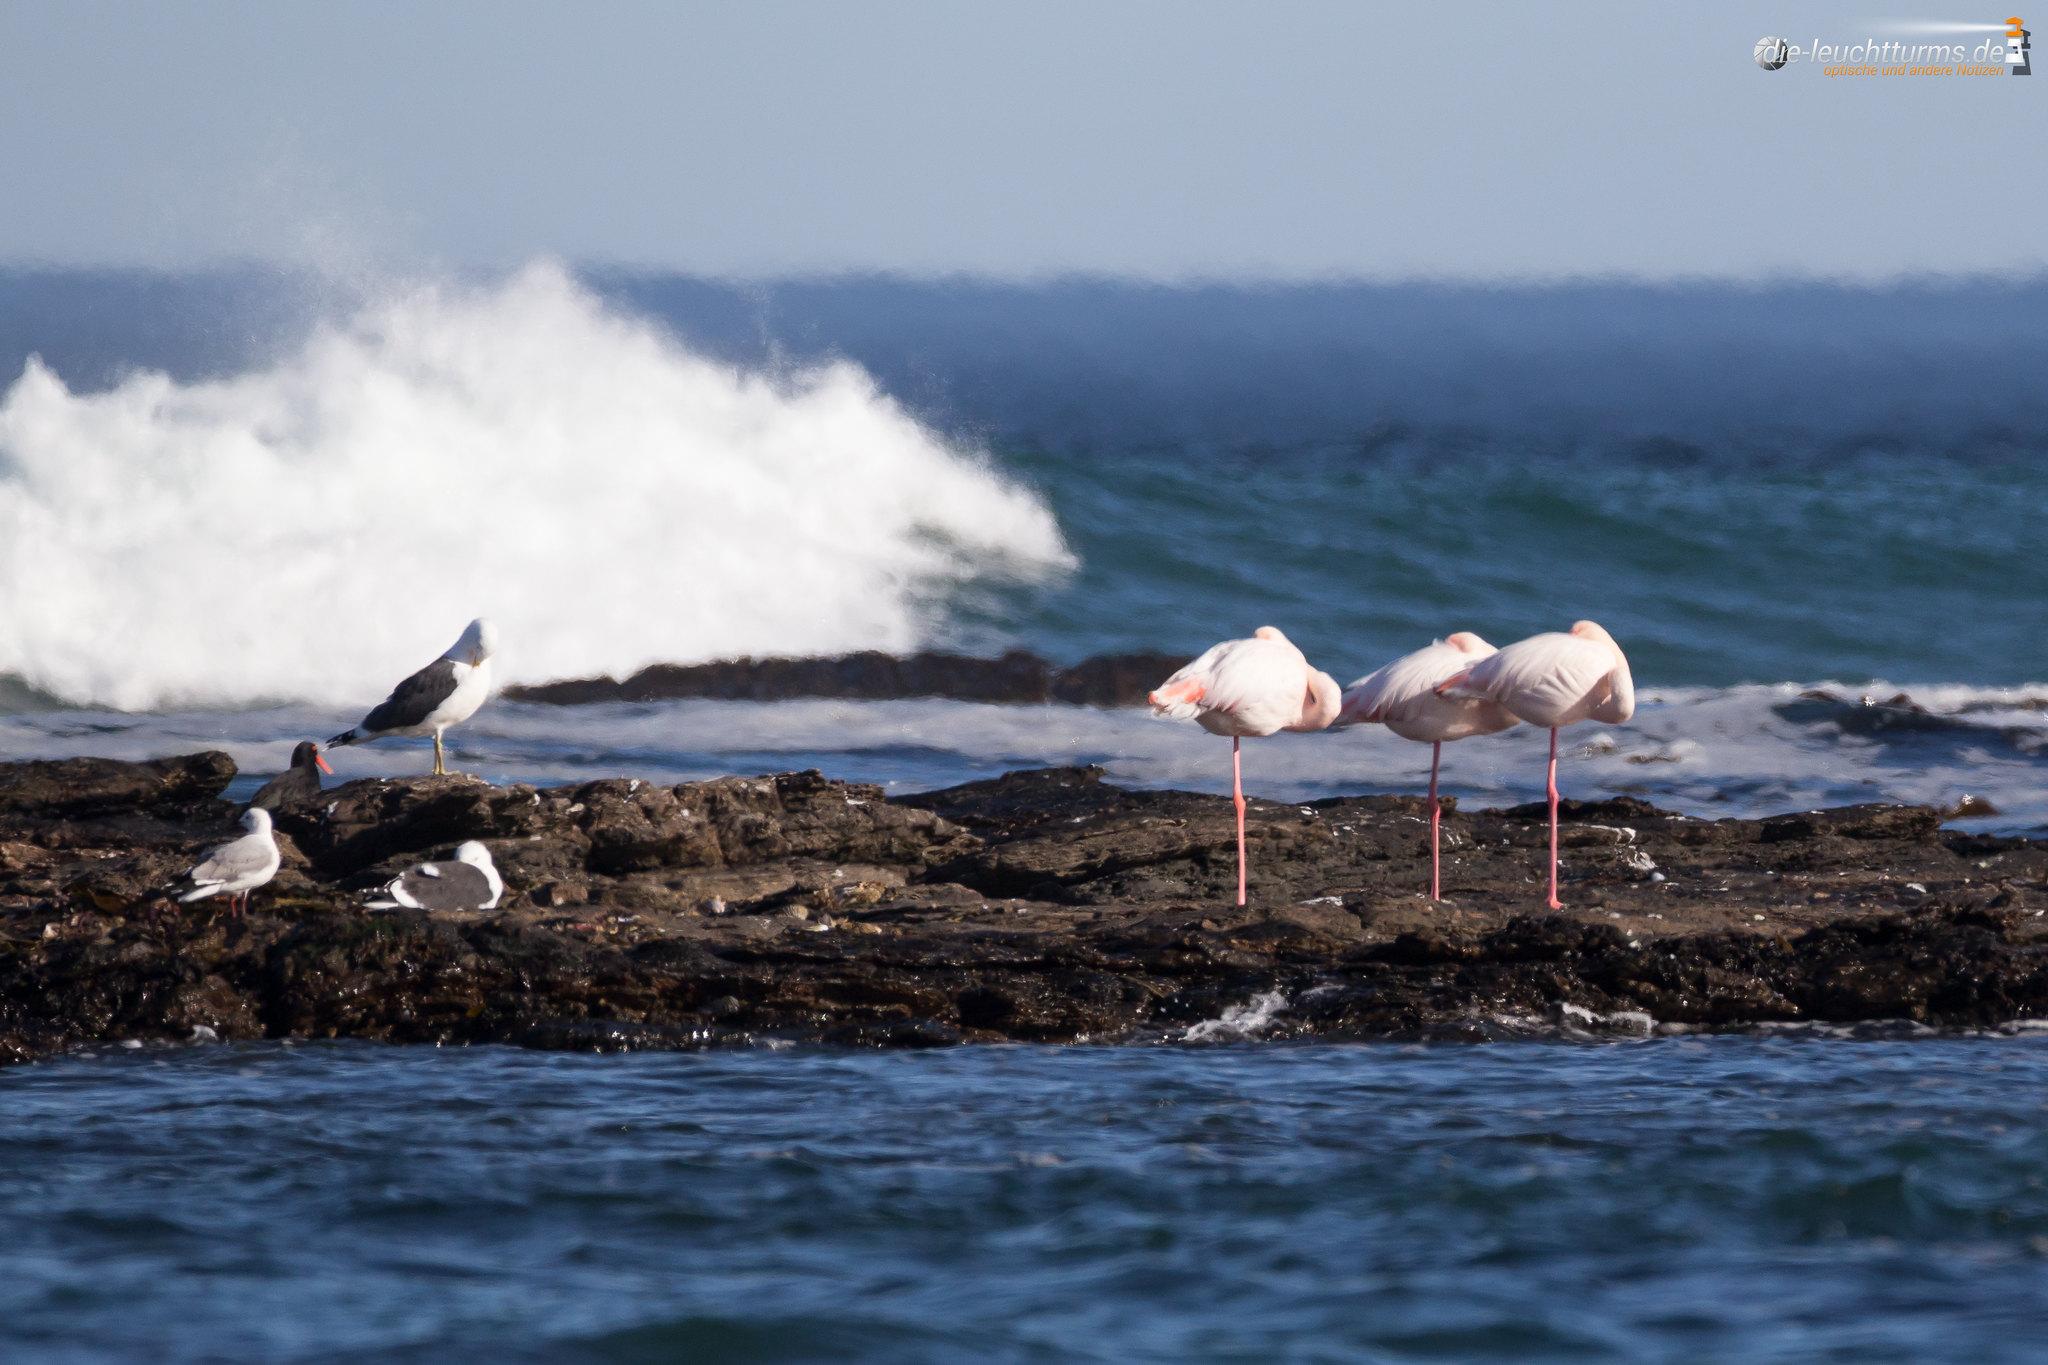 Flamingos in rough sea